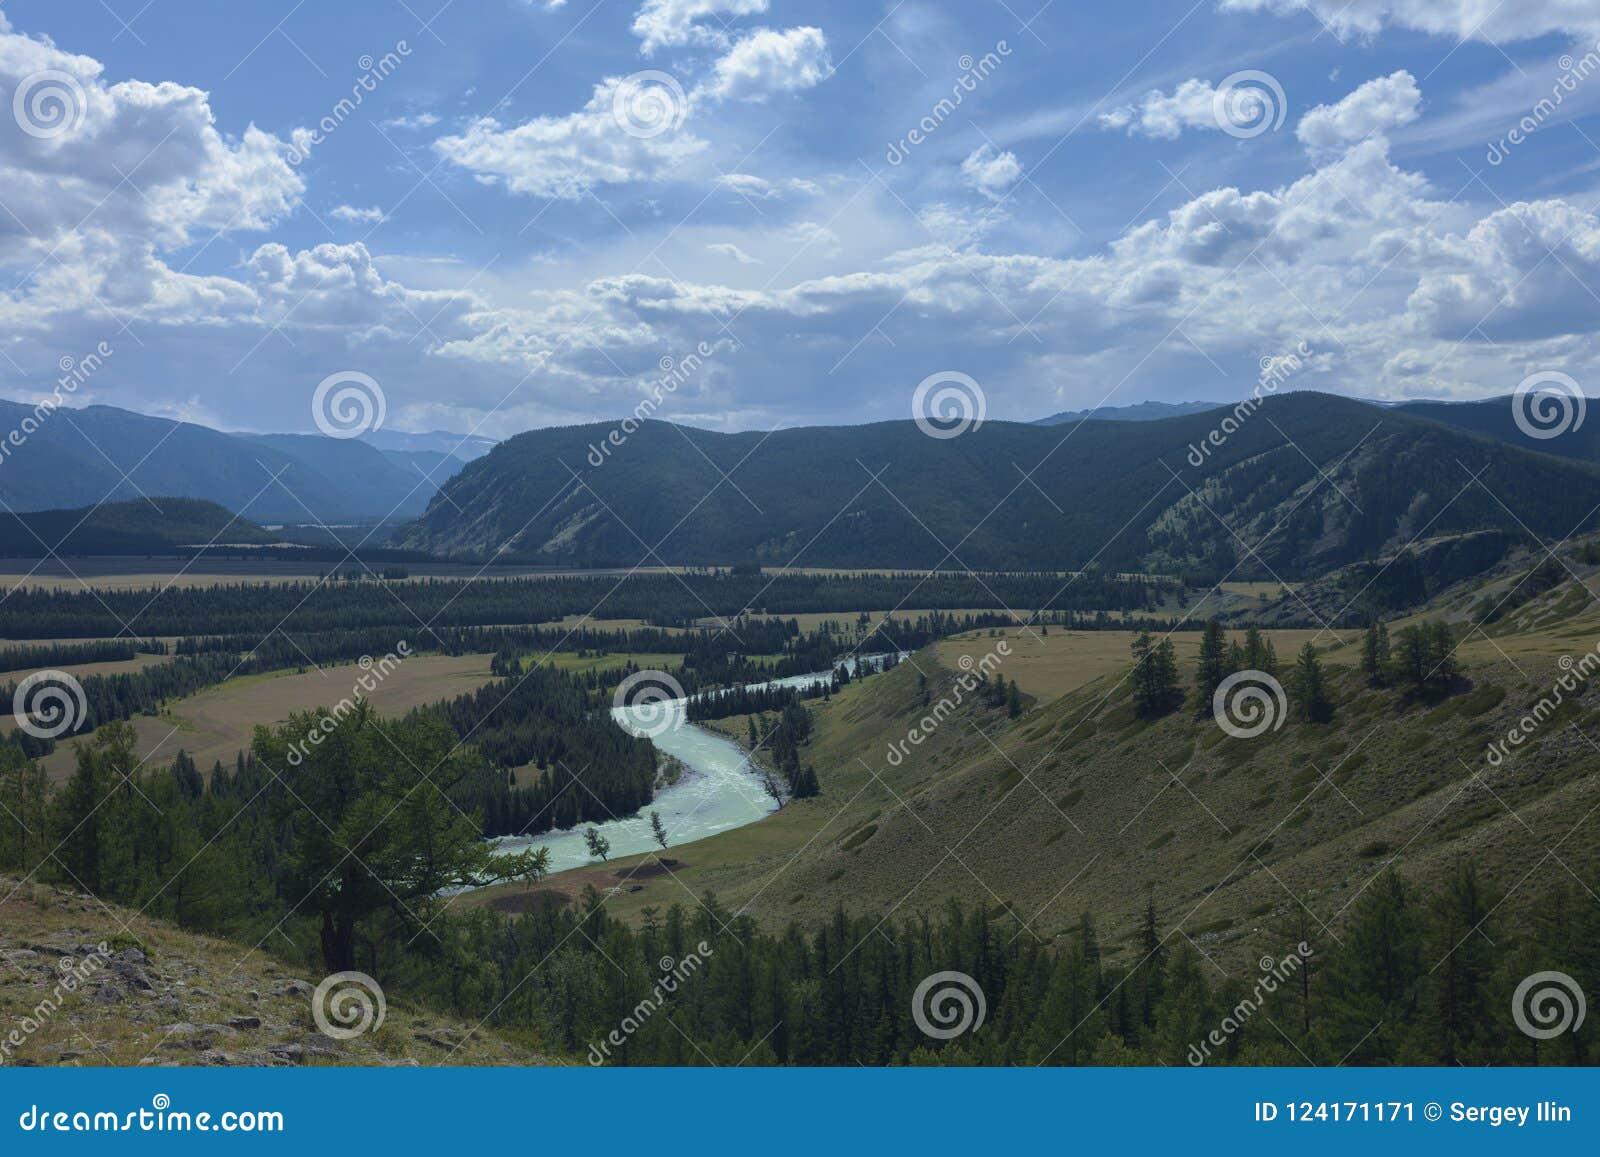 Altai mountains. River Argut. Beautiful highland landscape. Russ